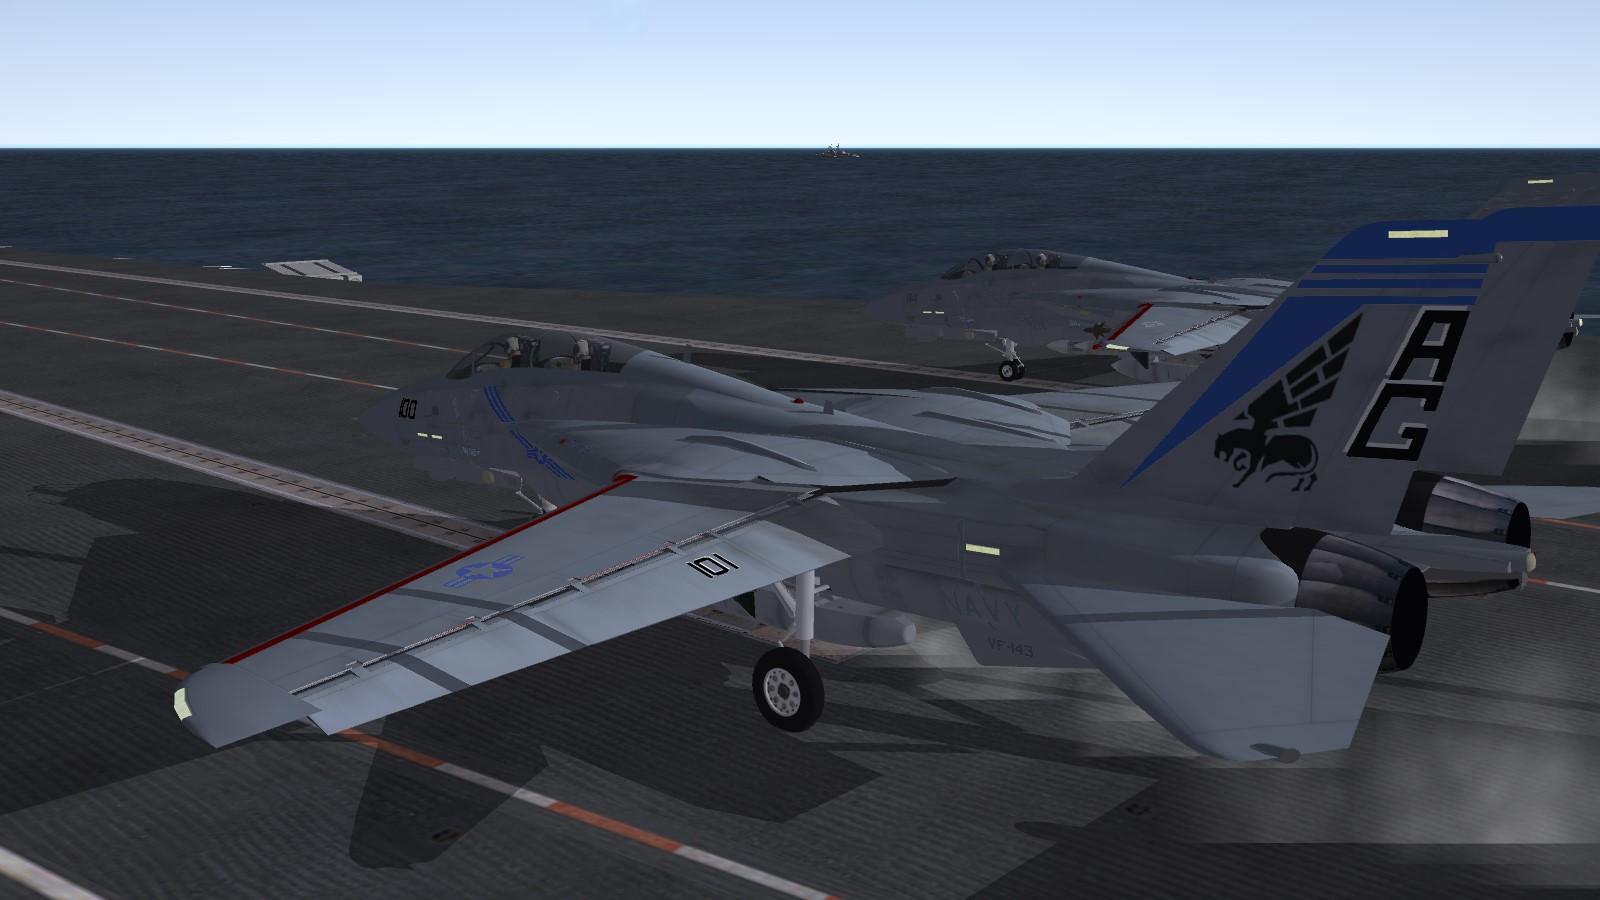 VF-143 Pukin' Dogs 1998-2001